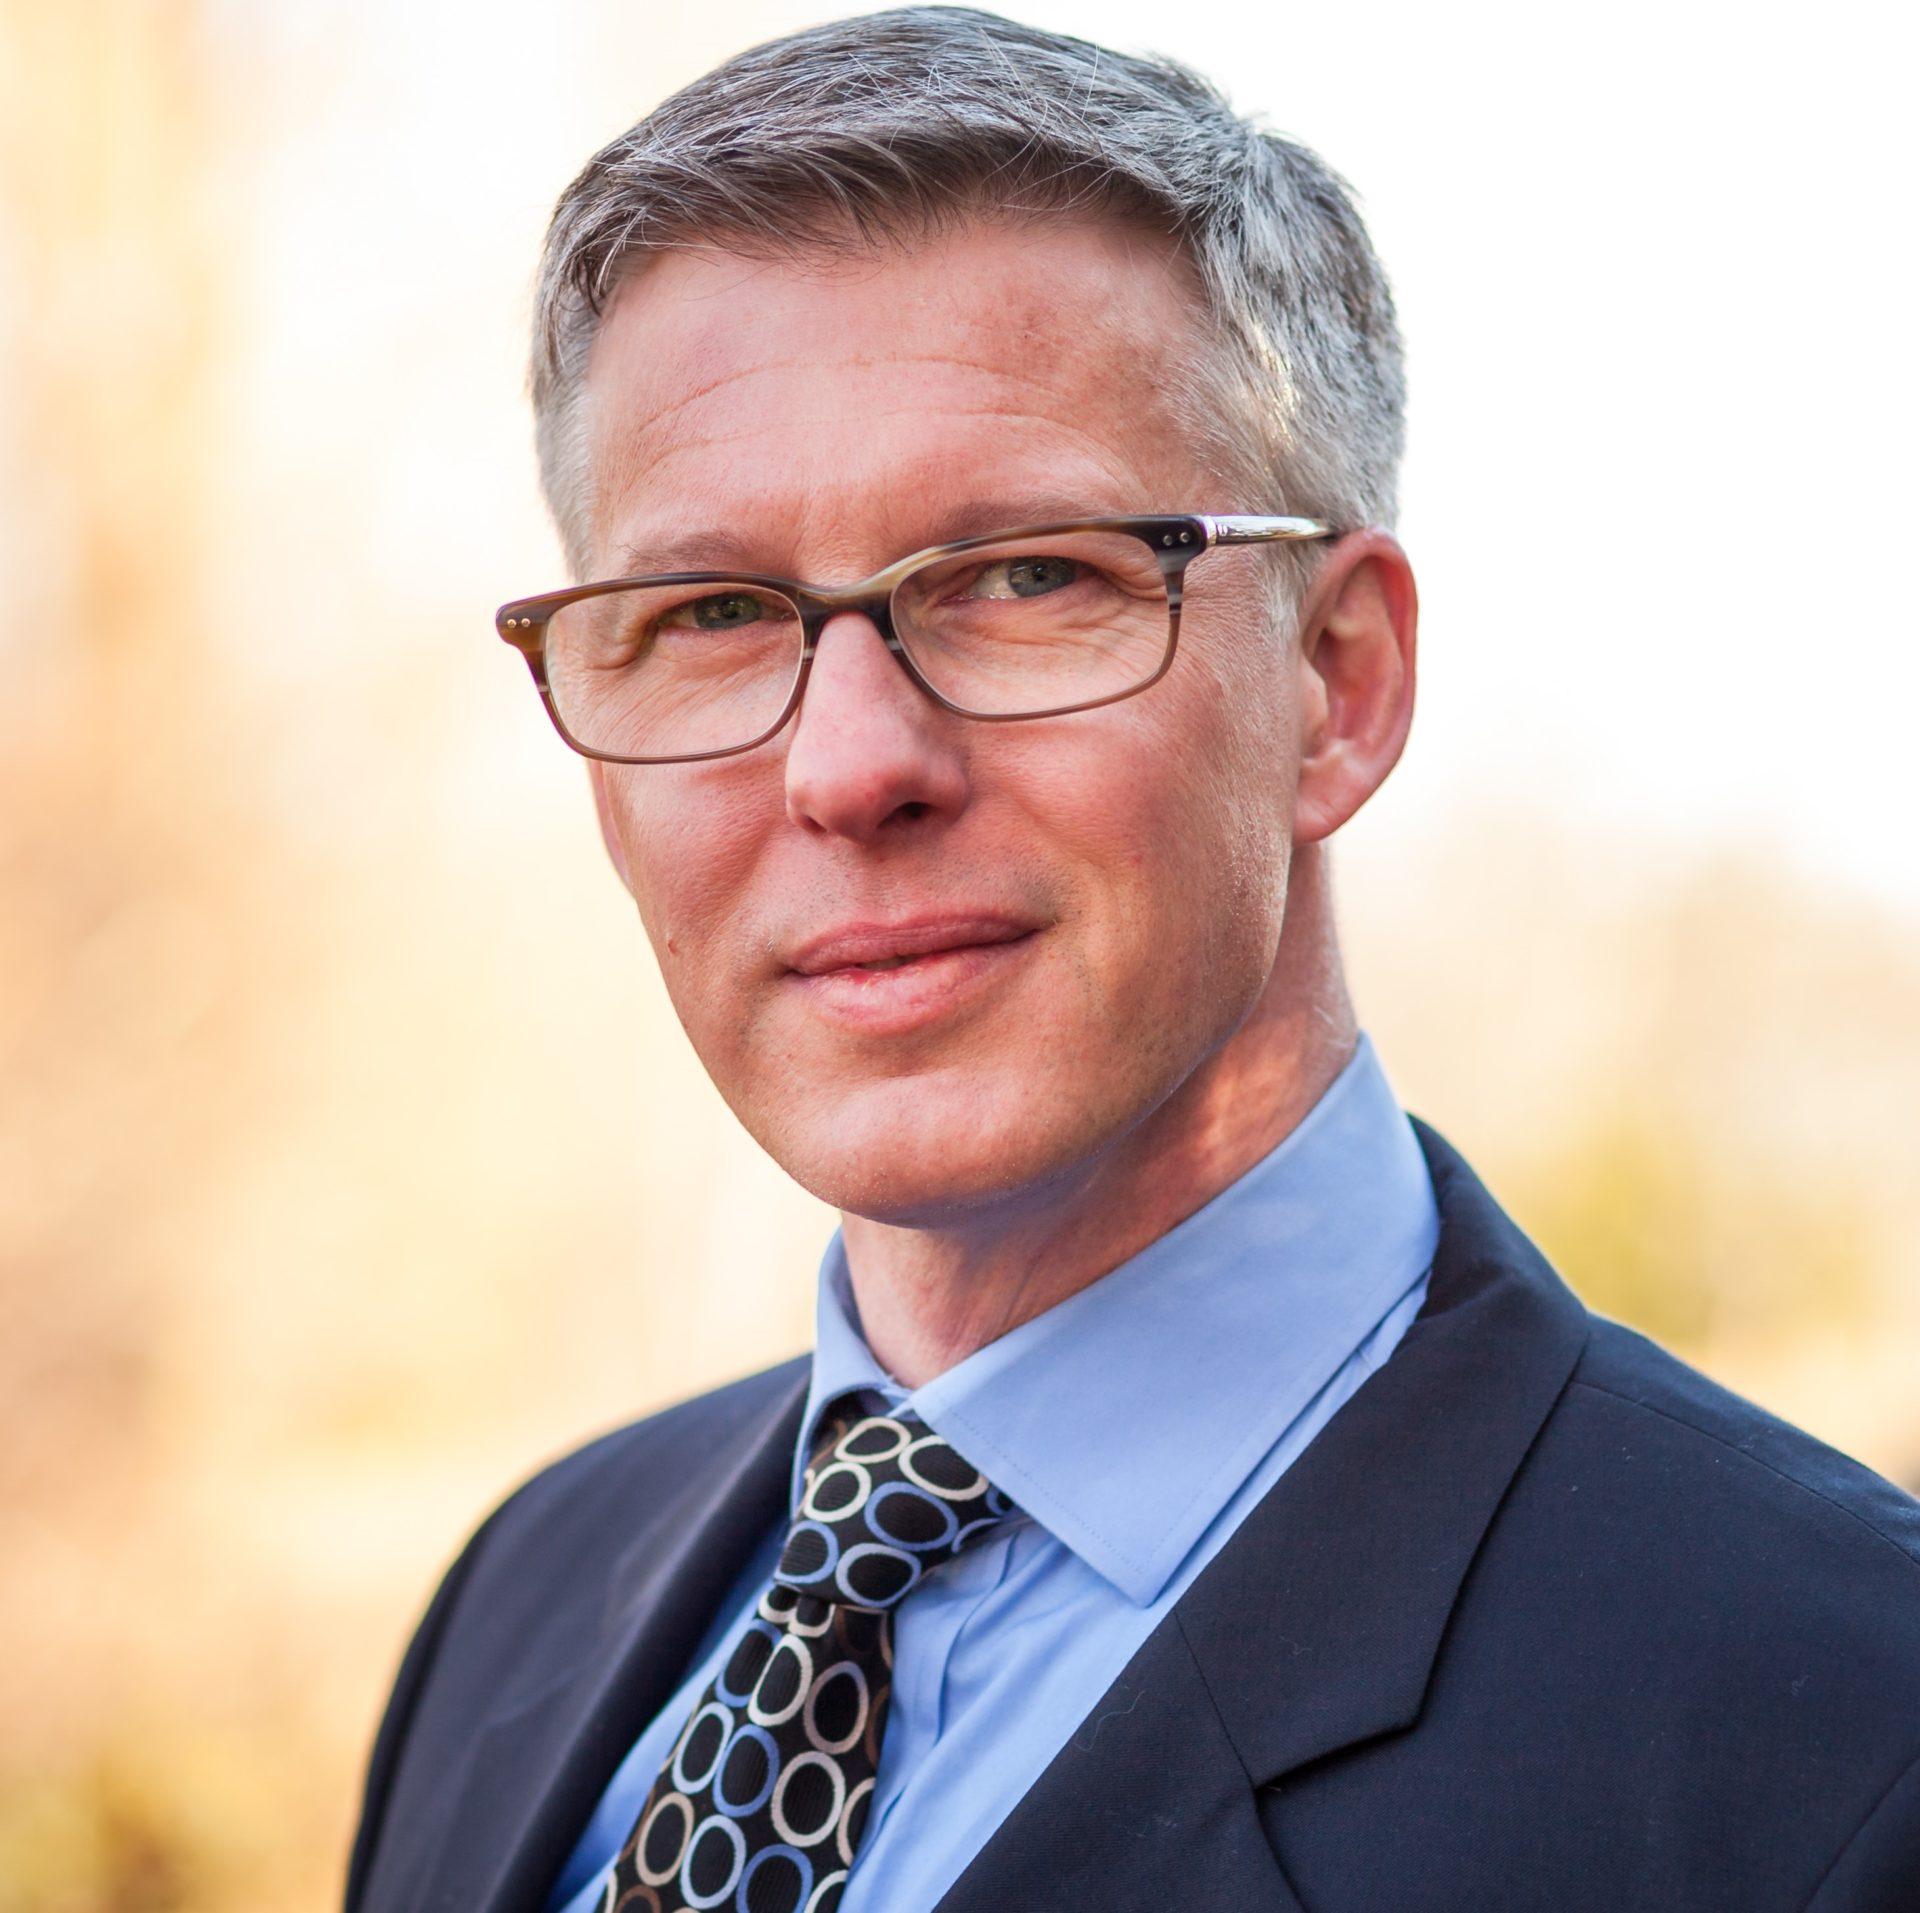 Harald Winkmann